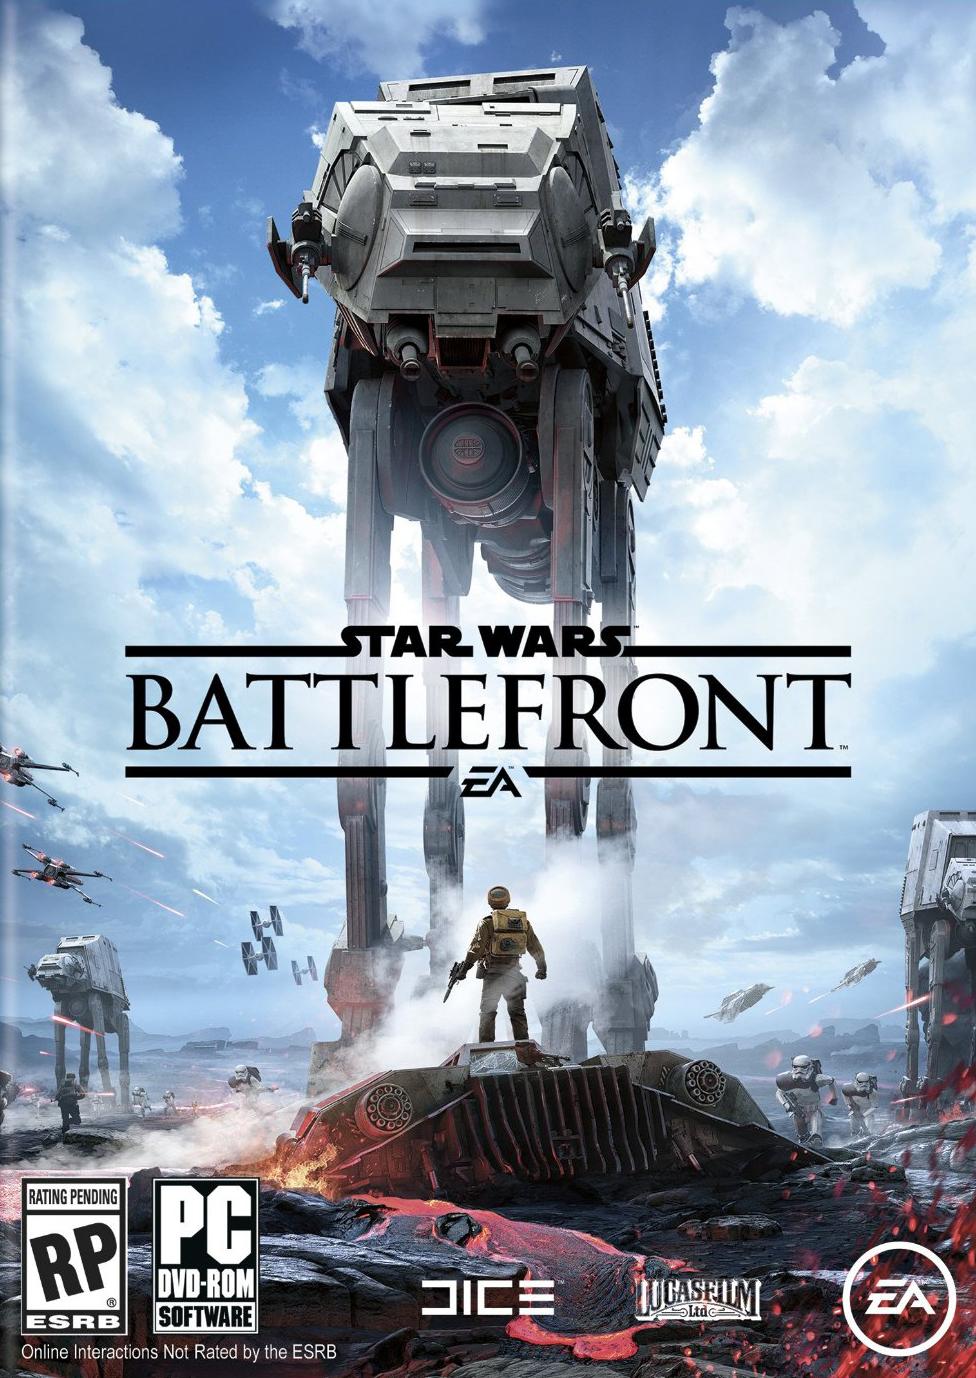 Star Wars: Battlefront 3 (2015)